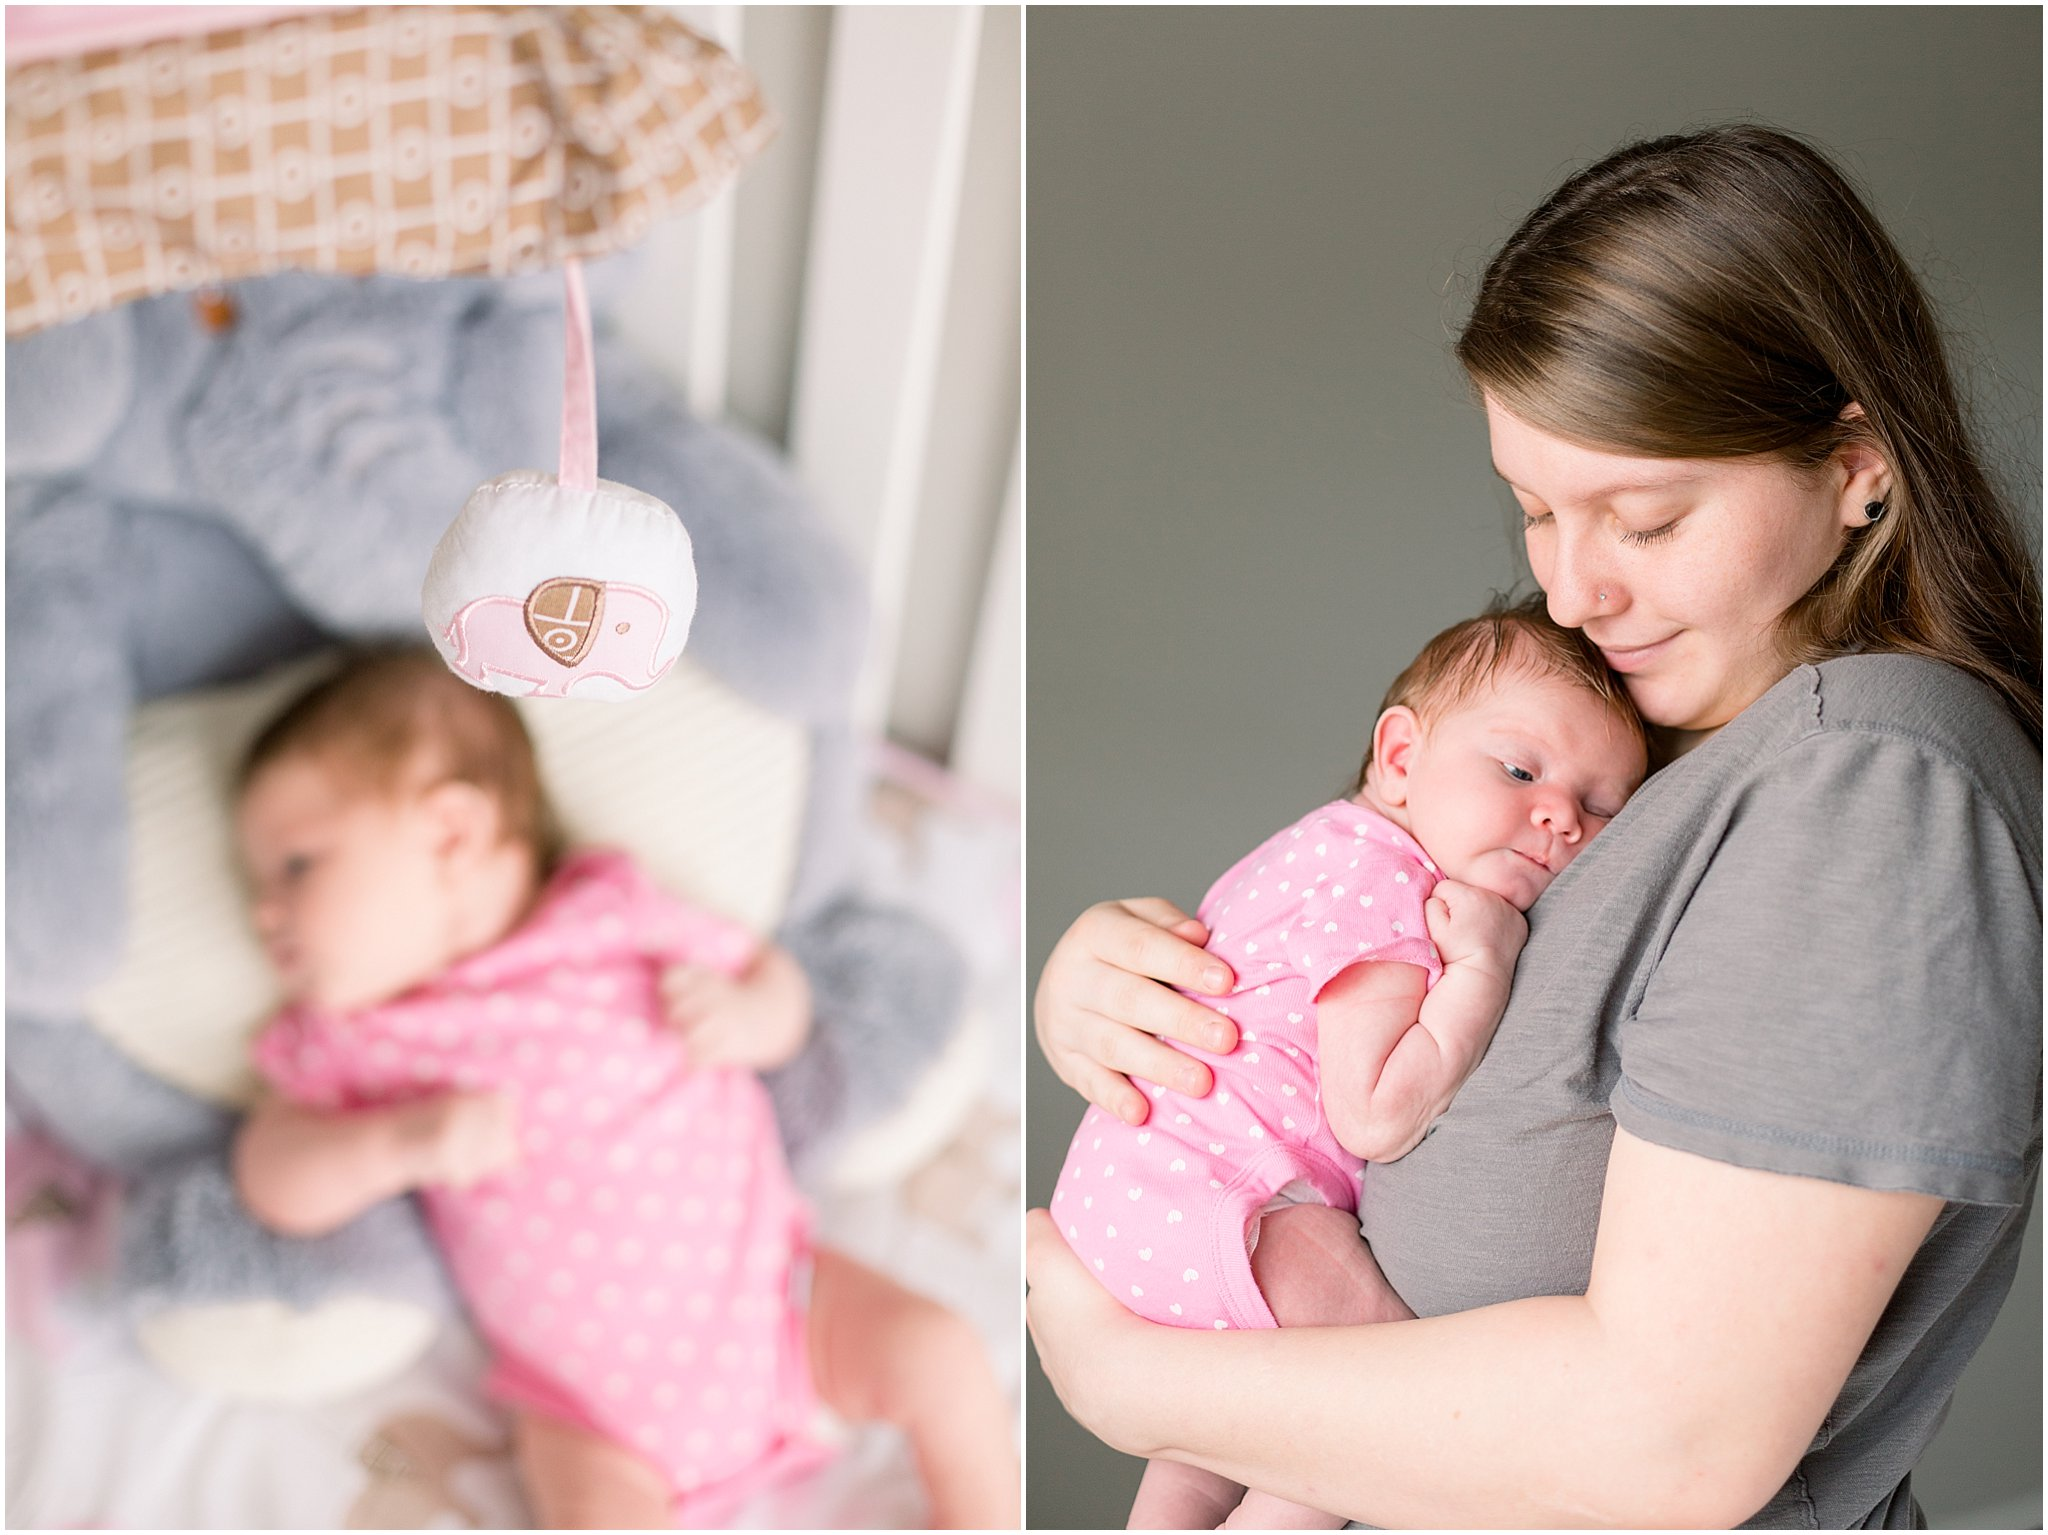 Winter-Garden-Maternity-Newborn-Photographer_0021.jpg